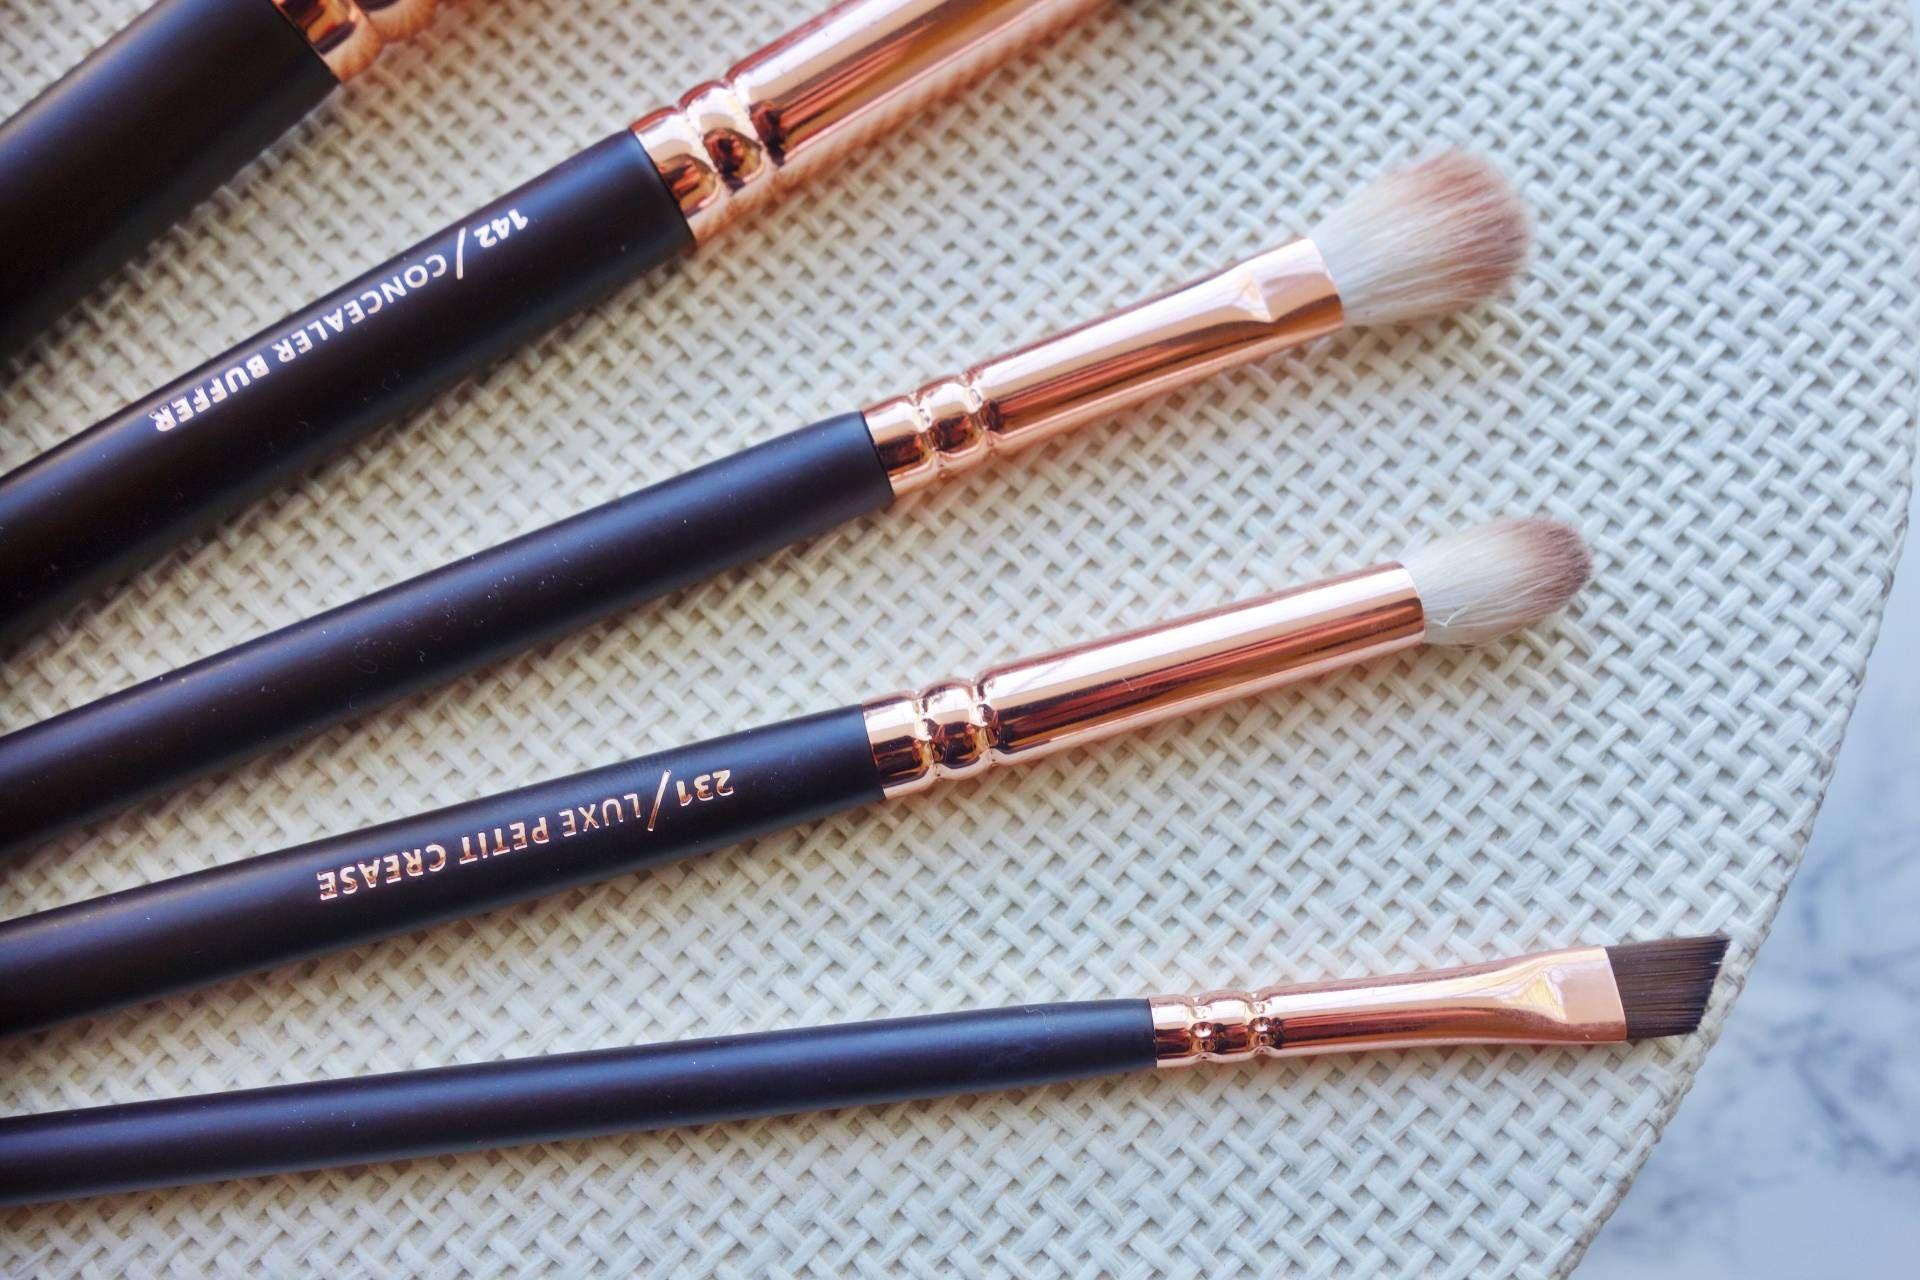 Zoeva Rose Golden Luxury Brush Set Brush set, How to